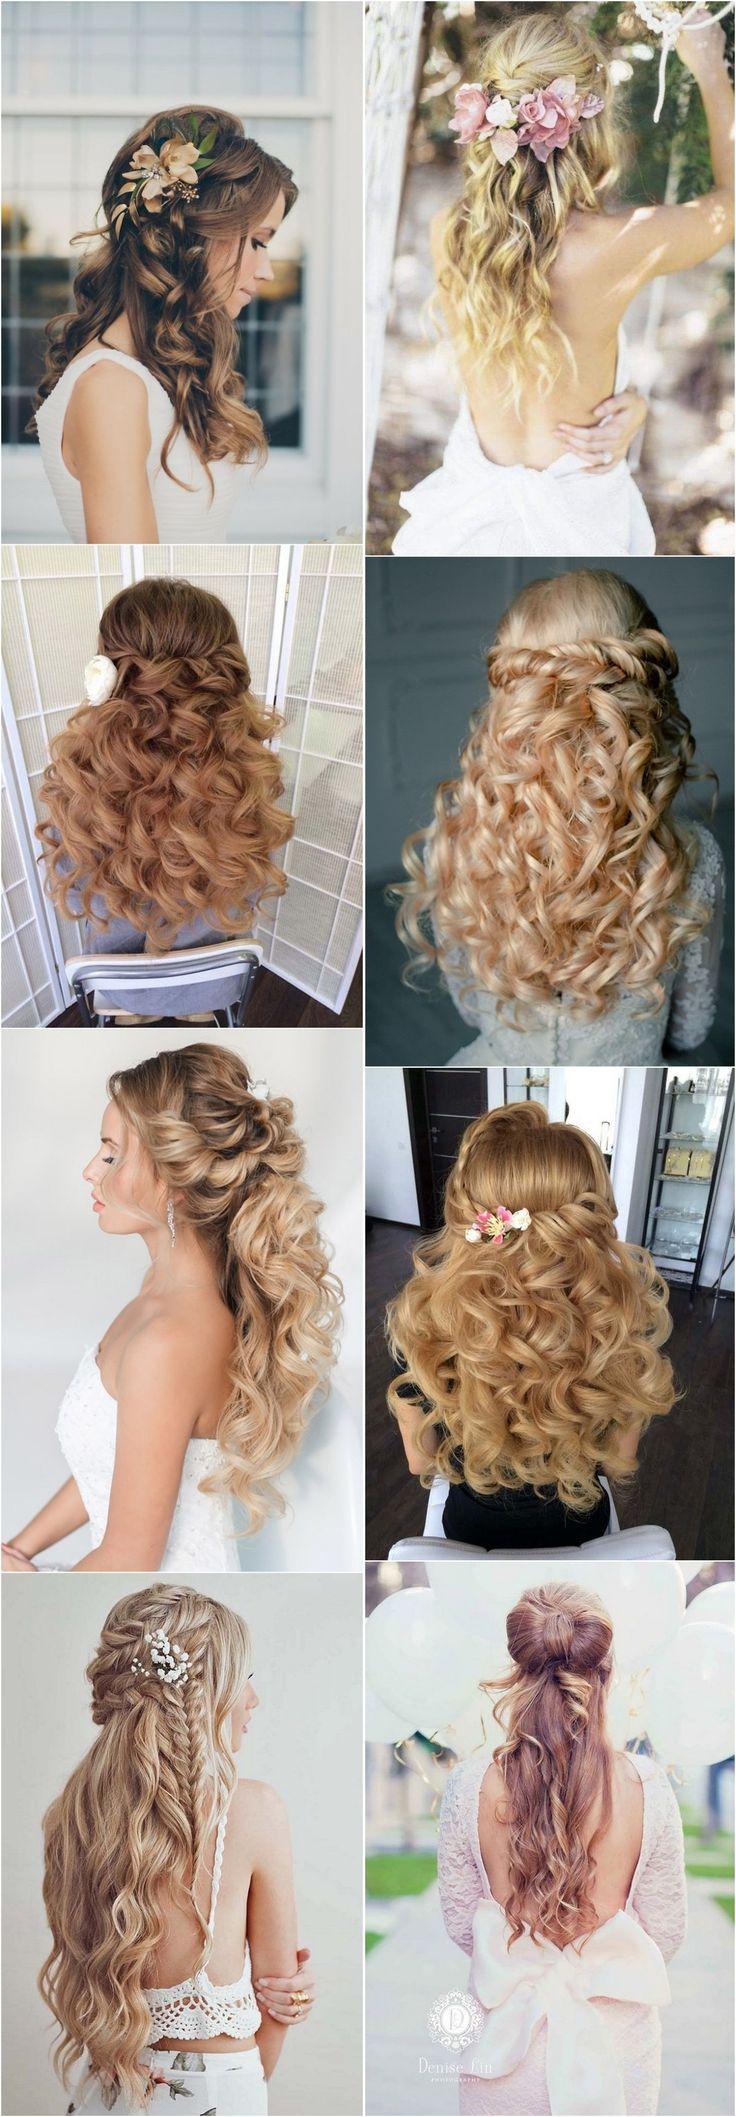 40 Stunning Half Up Half Down Wedding Hairstyles with Tutorial / www.deerpearlfl...